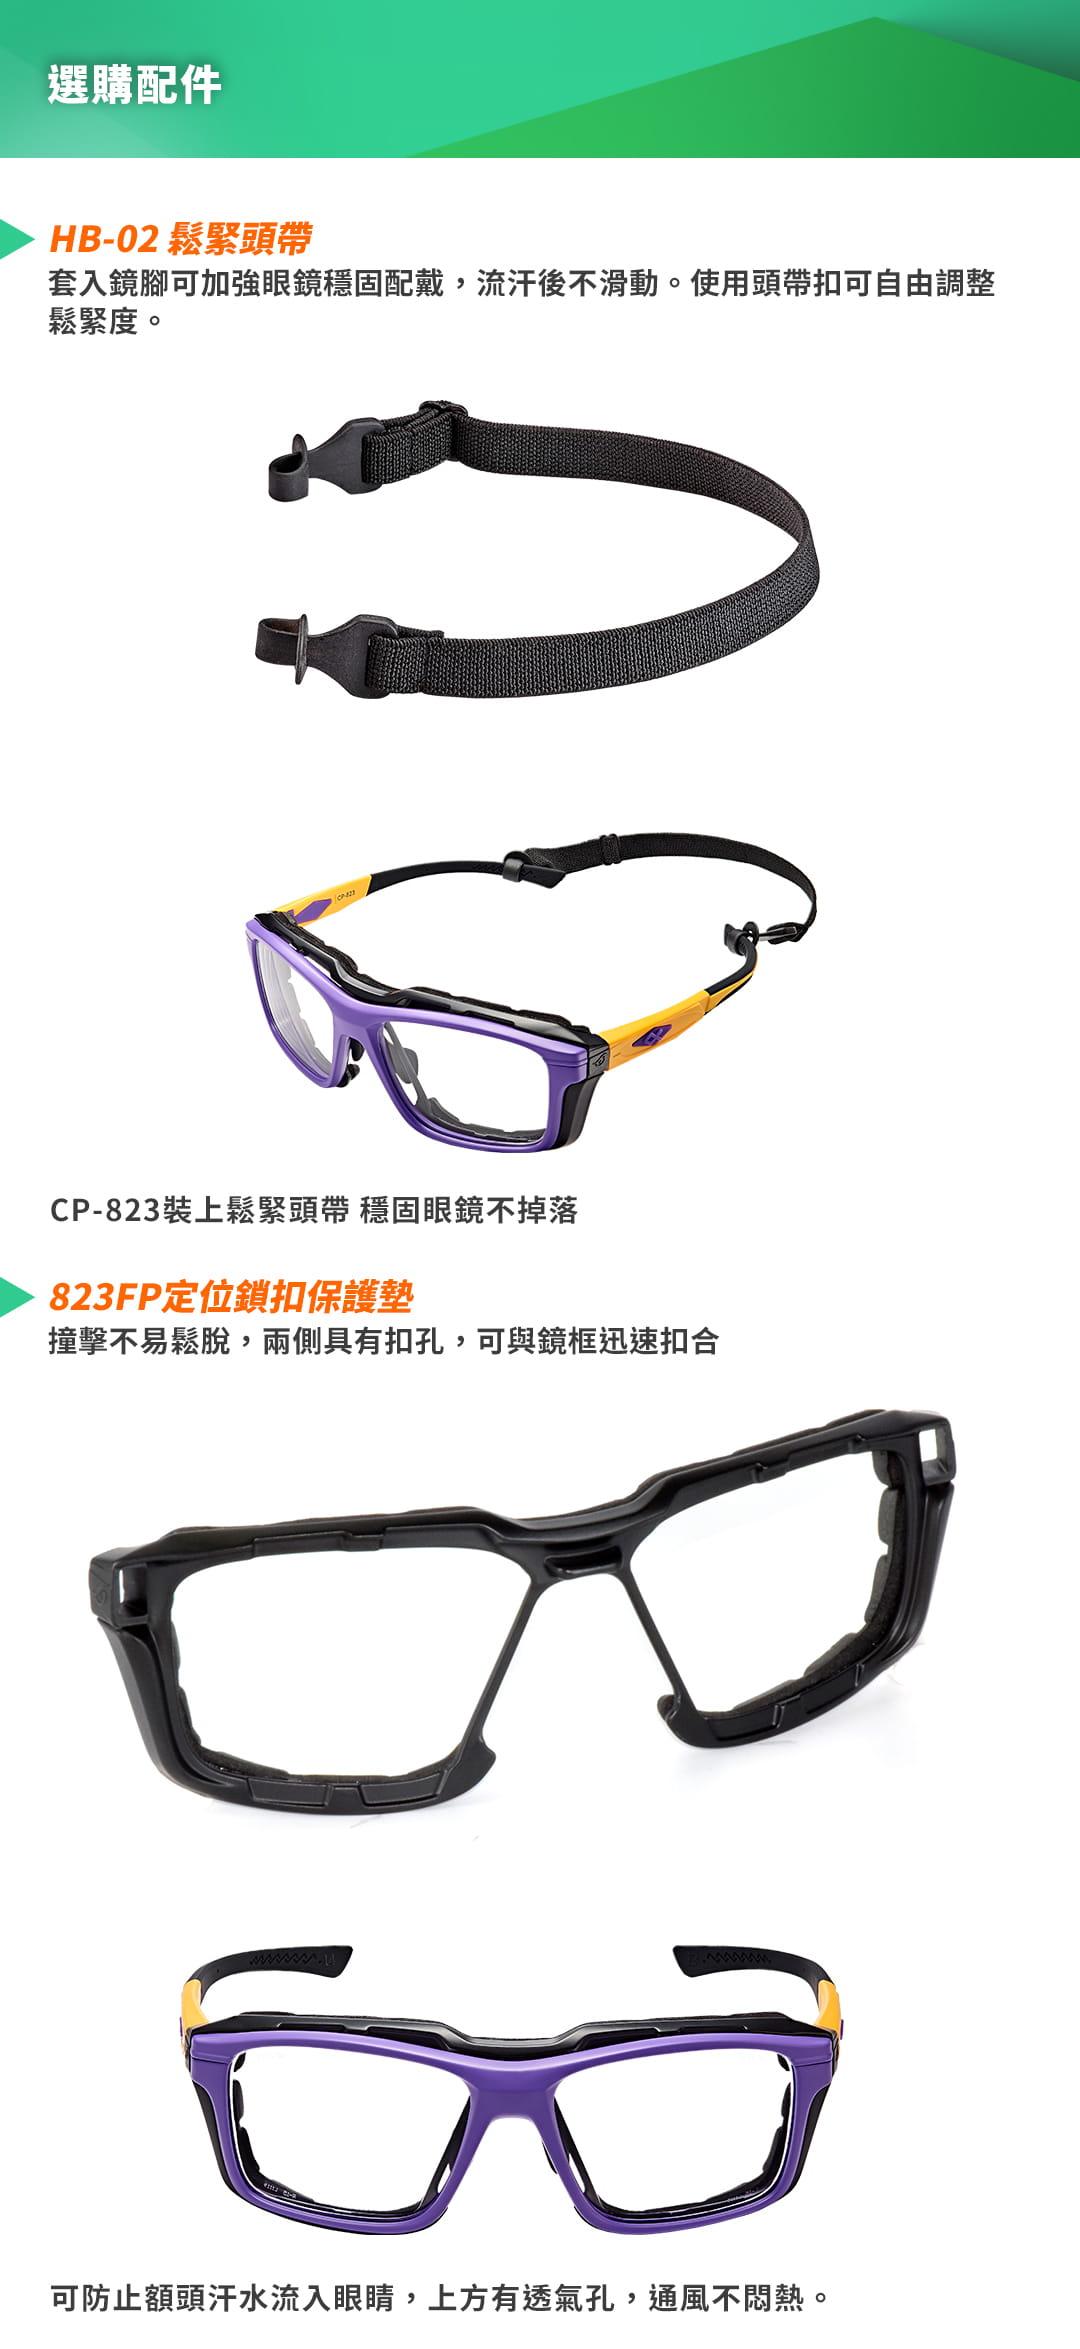 SABLE黑貂光學-專屬球類運動眼鏡CP-823(標準款-無保護墊)+SP-03(平光精緻鍍膜鏡片) 2